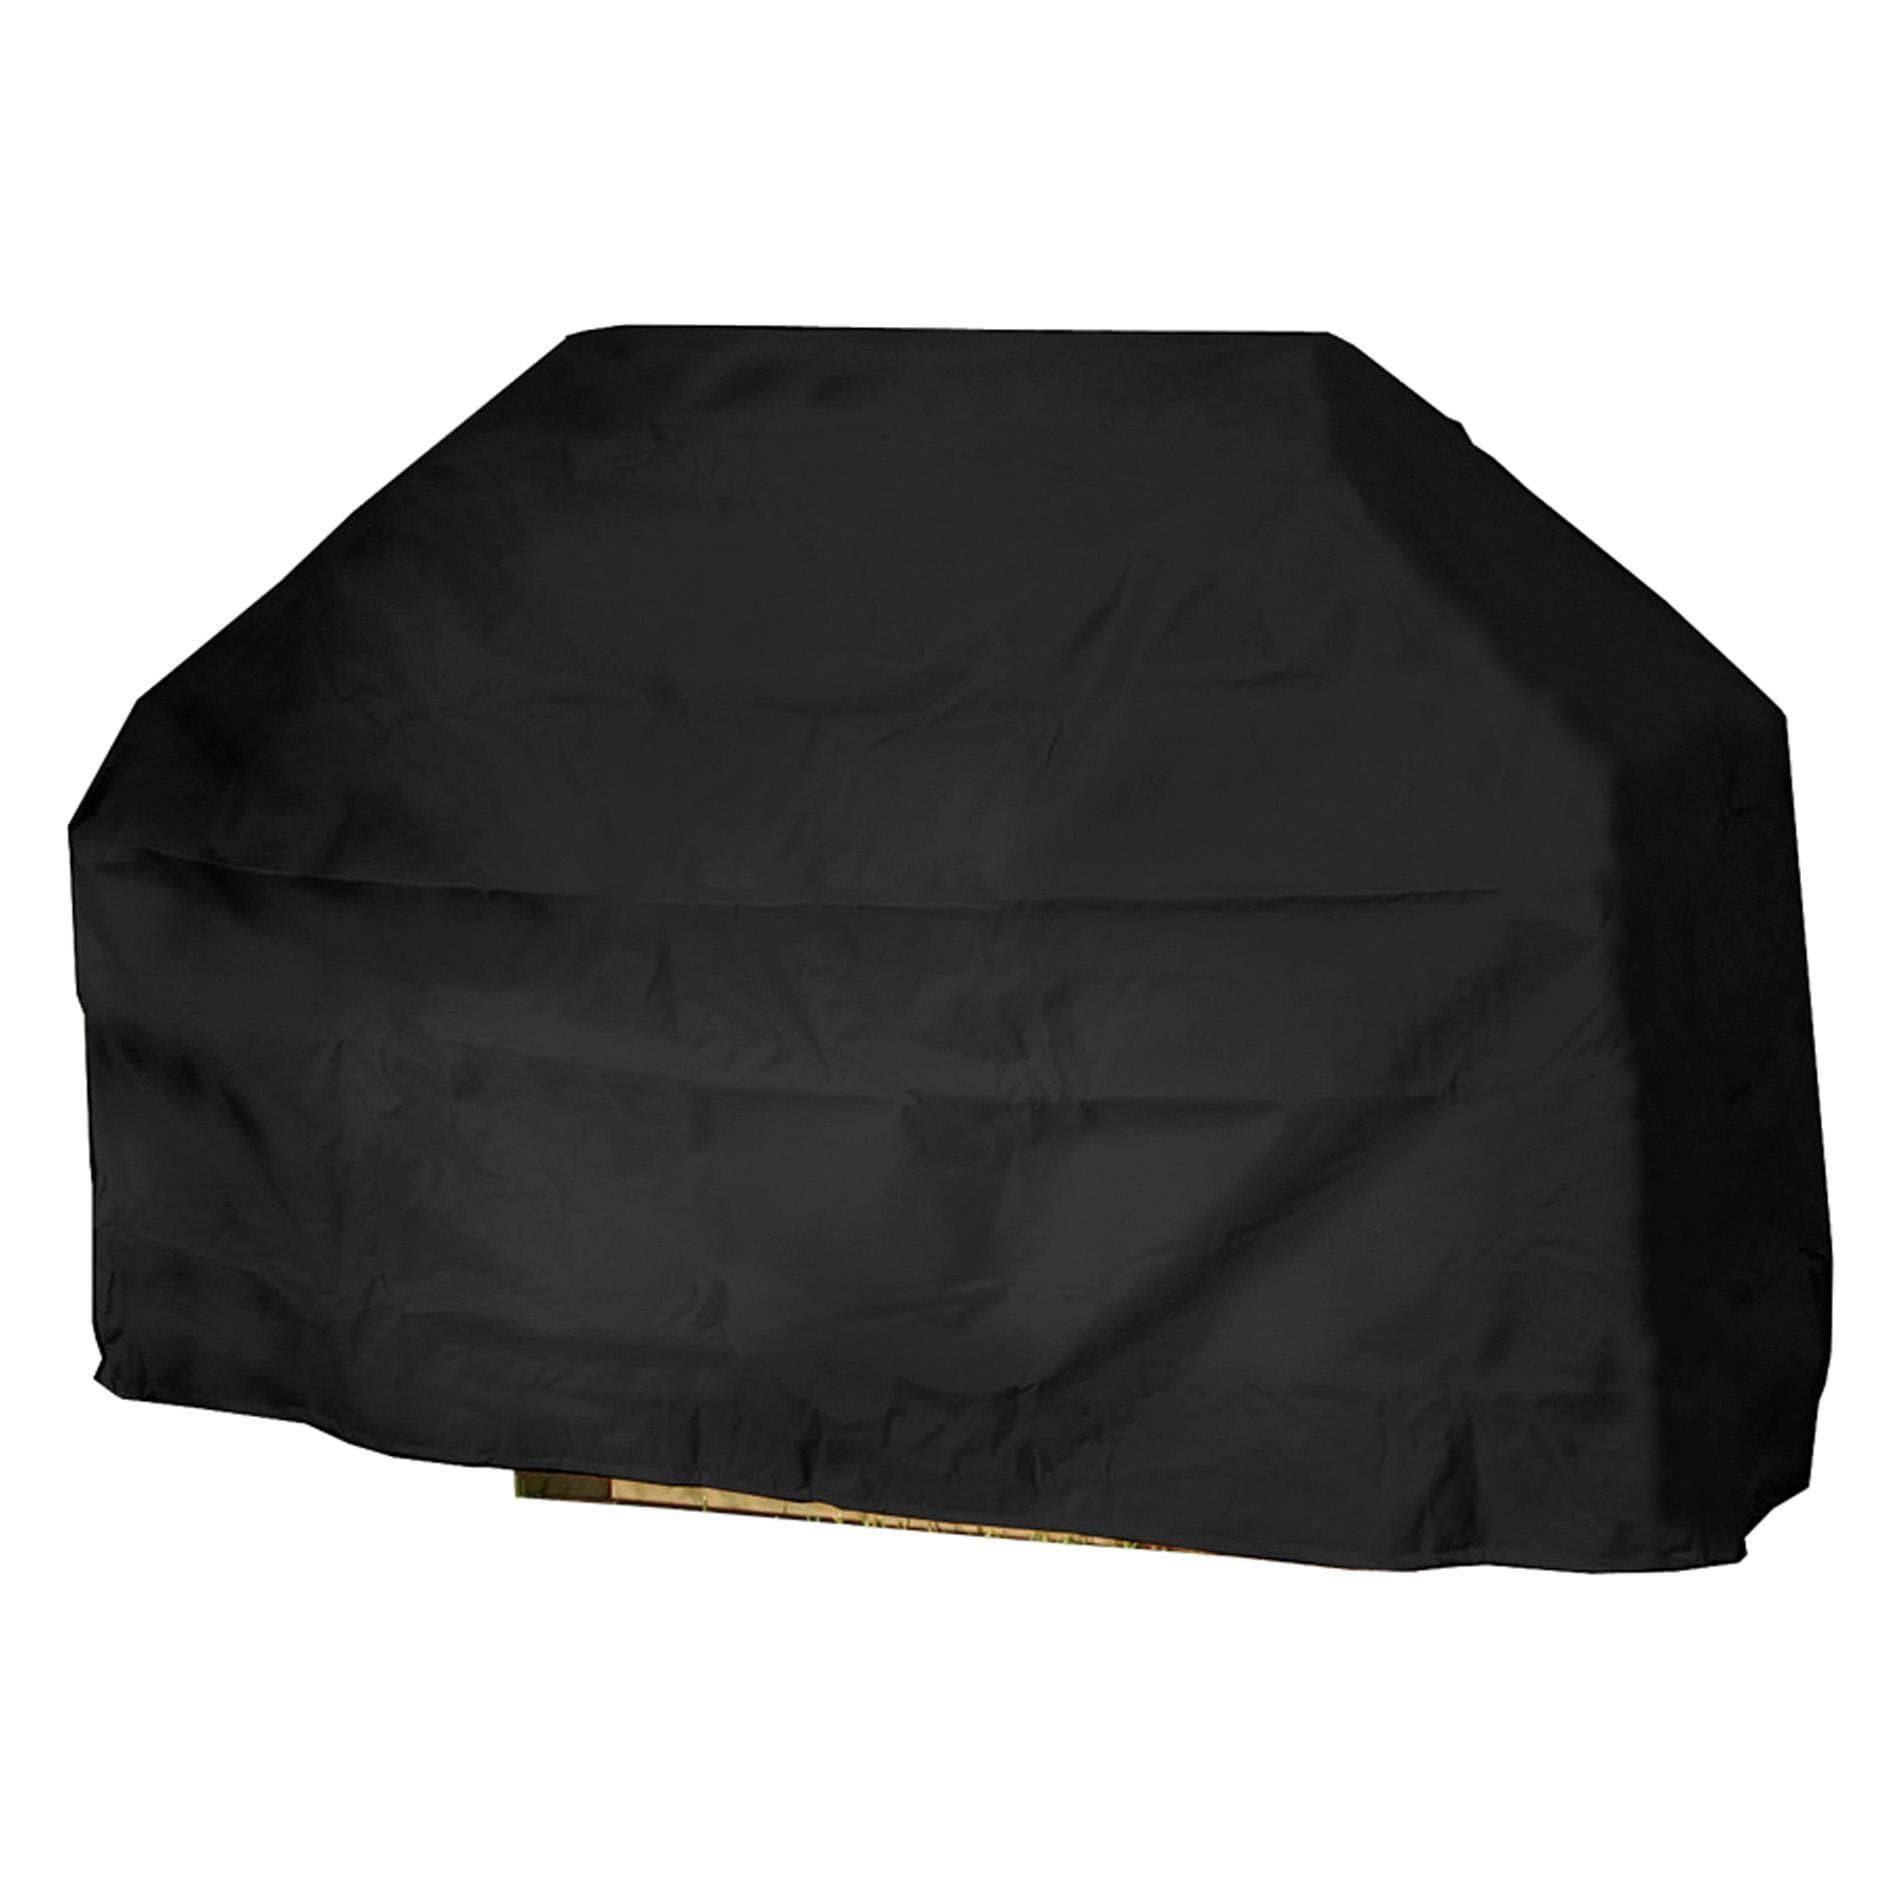 Mr. BBQ Medium Length 65-inch Grill Cover